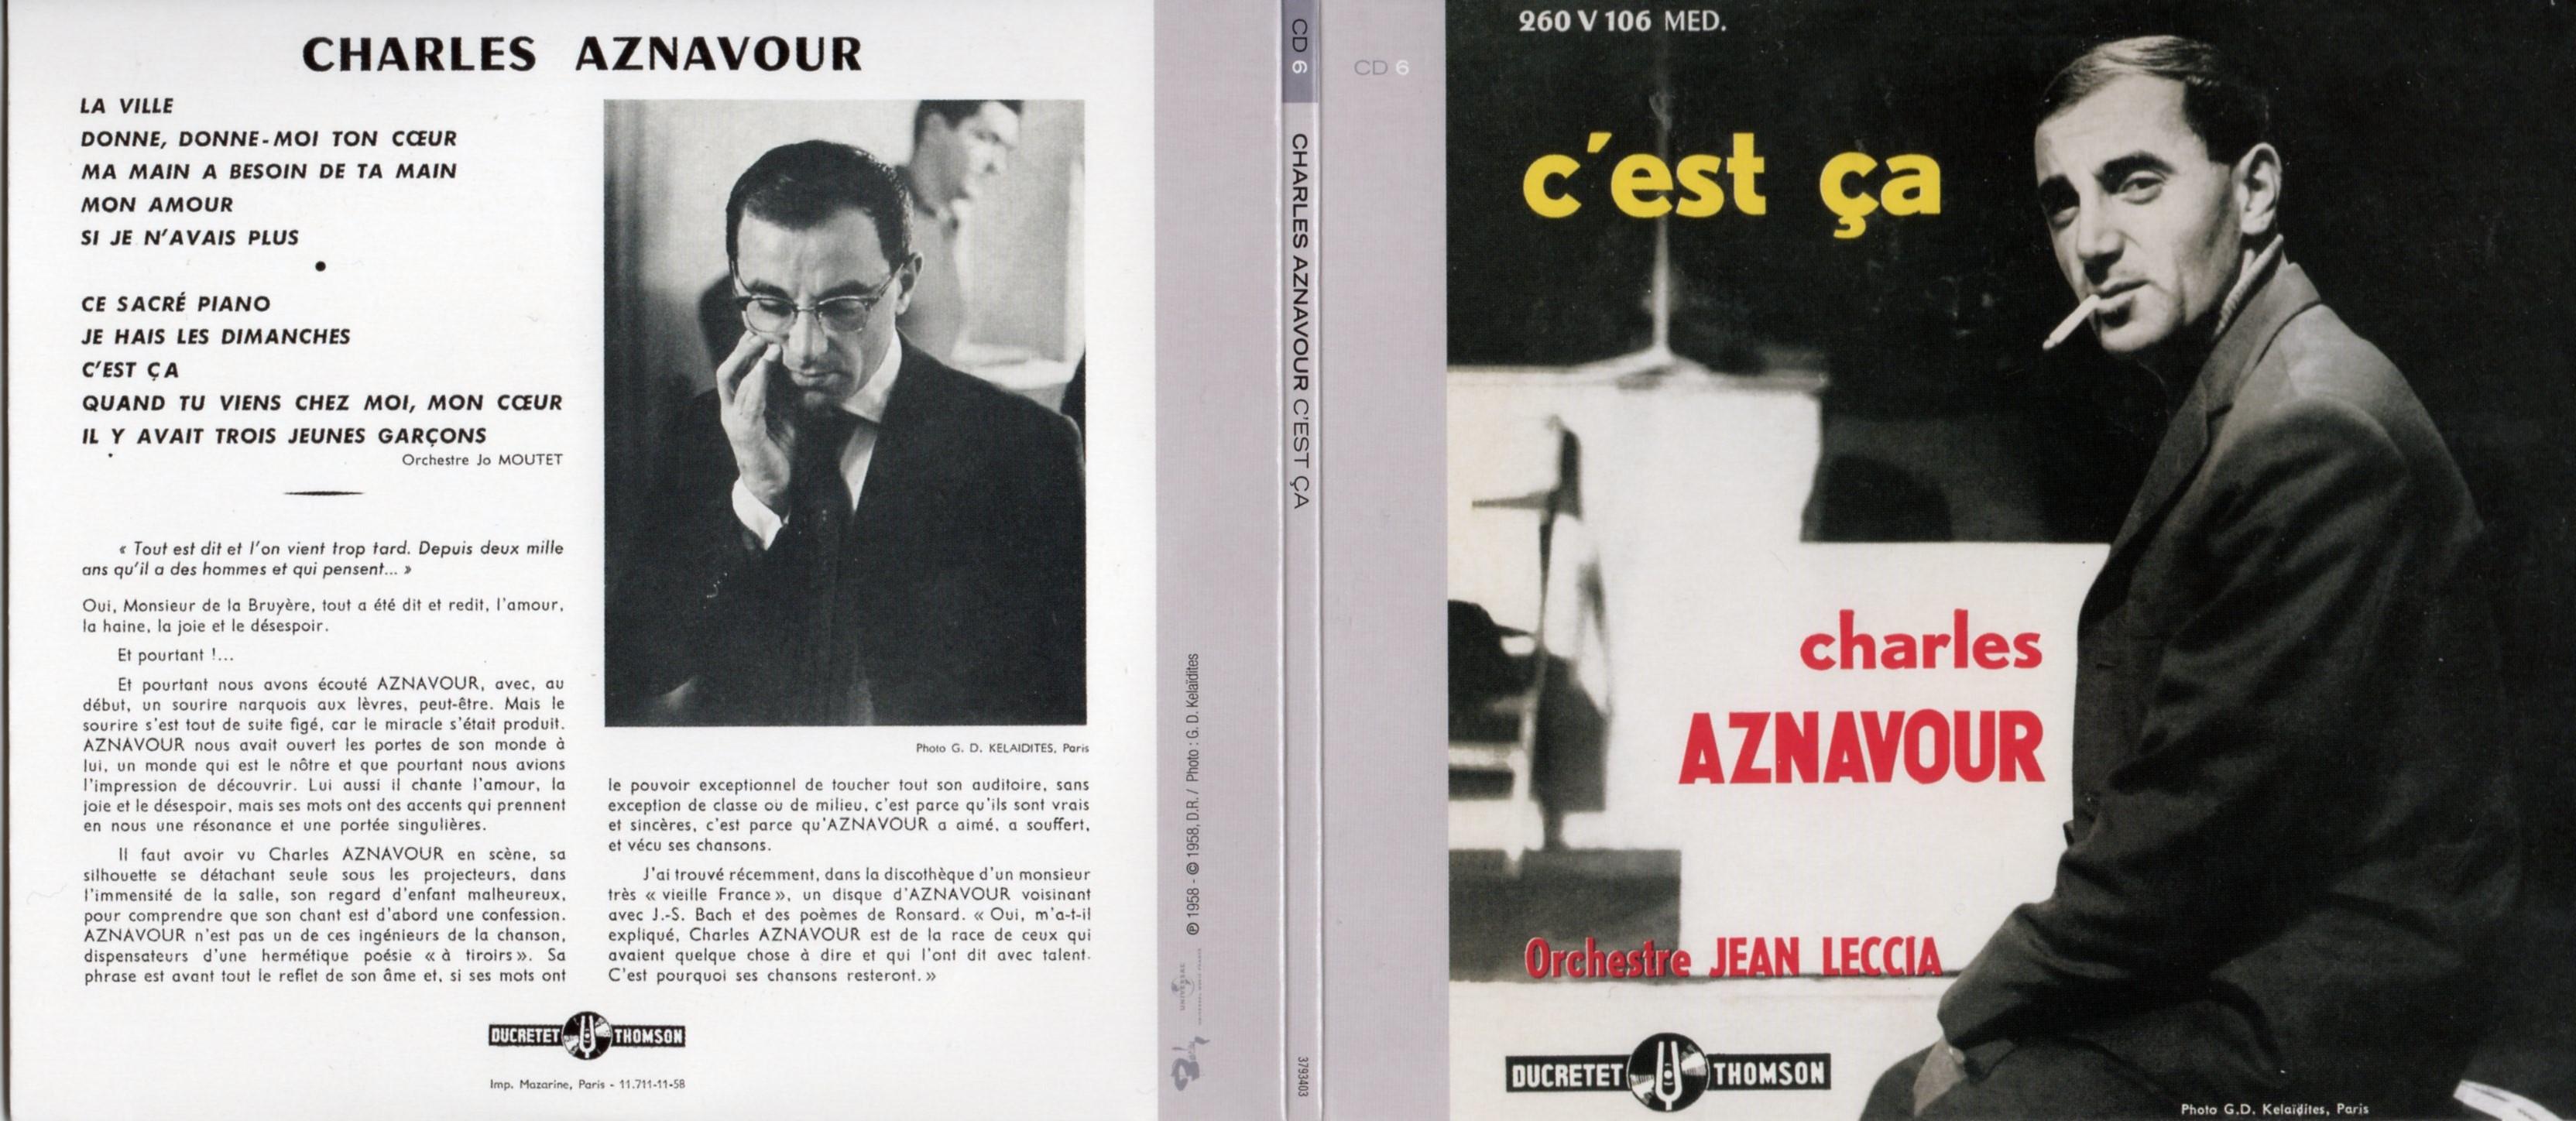 CHARLES AZNAVOUR - C'est ça (1958) Gatefold Card board REPLICA sleeve - CD